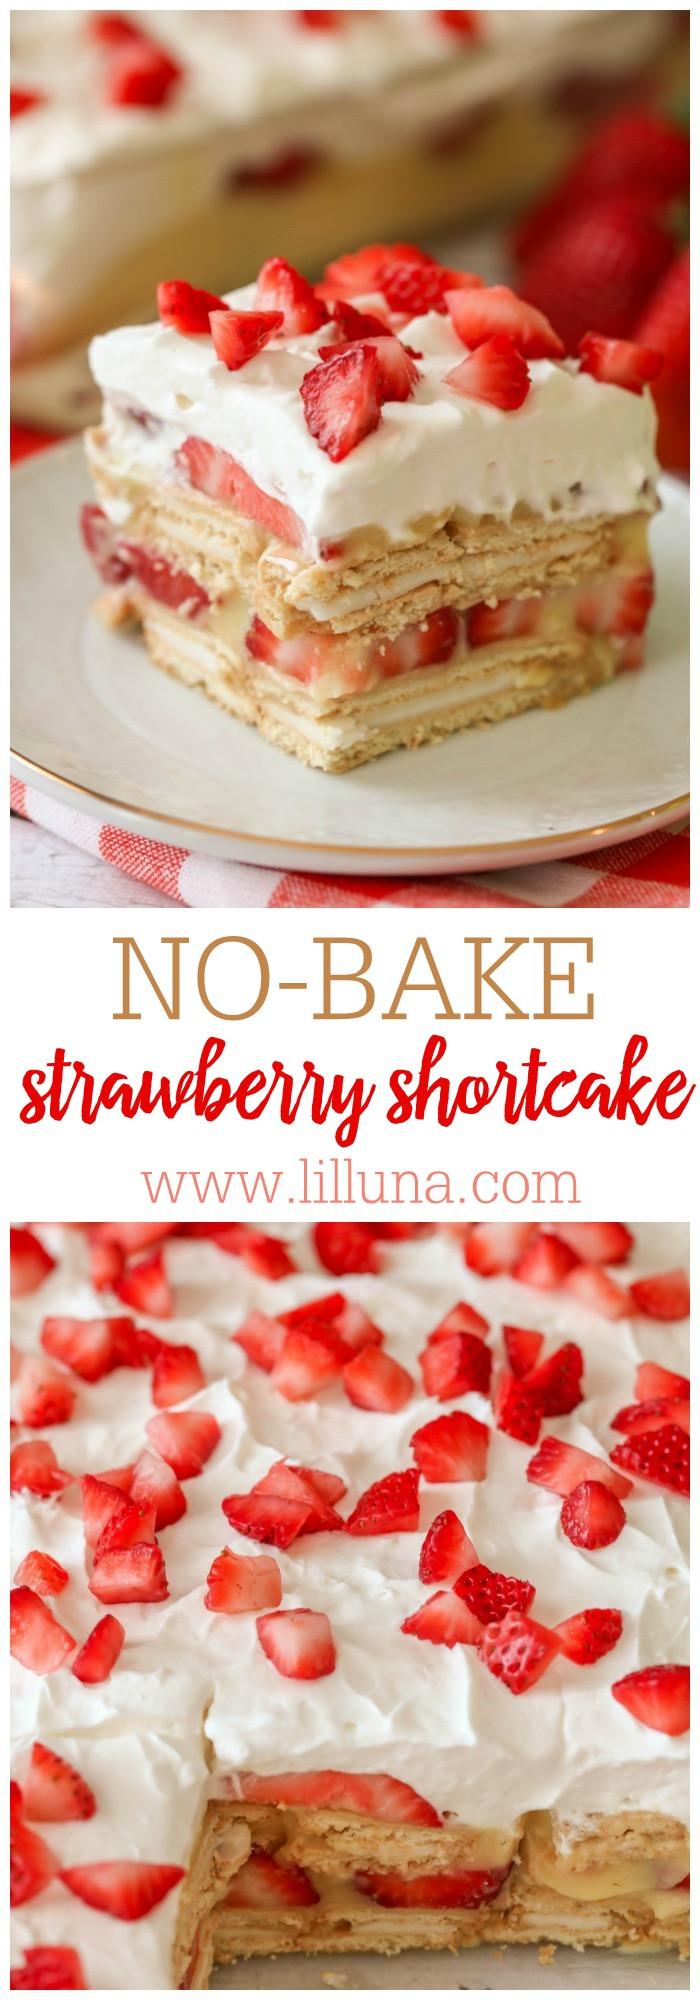 No Bake Strawberry Dessert  No Bake Strawberry Shortcake Lil Luna